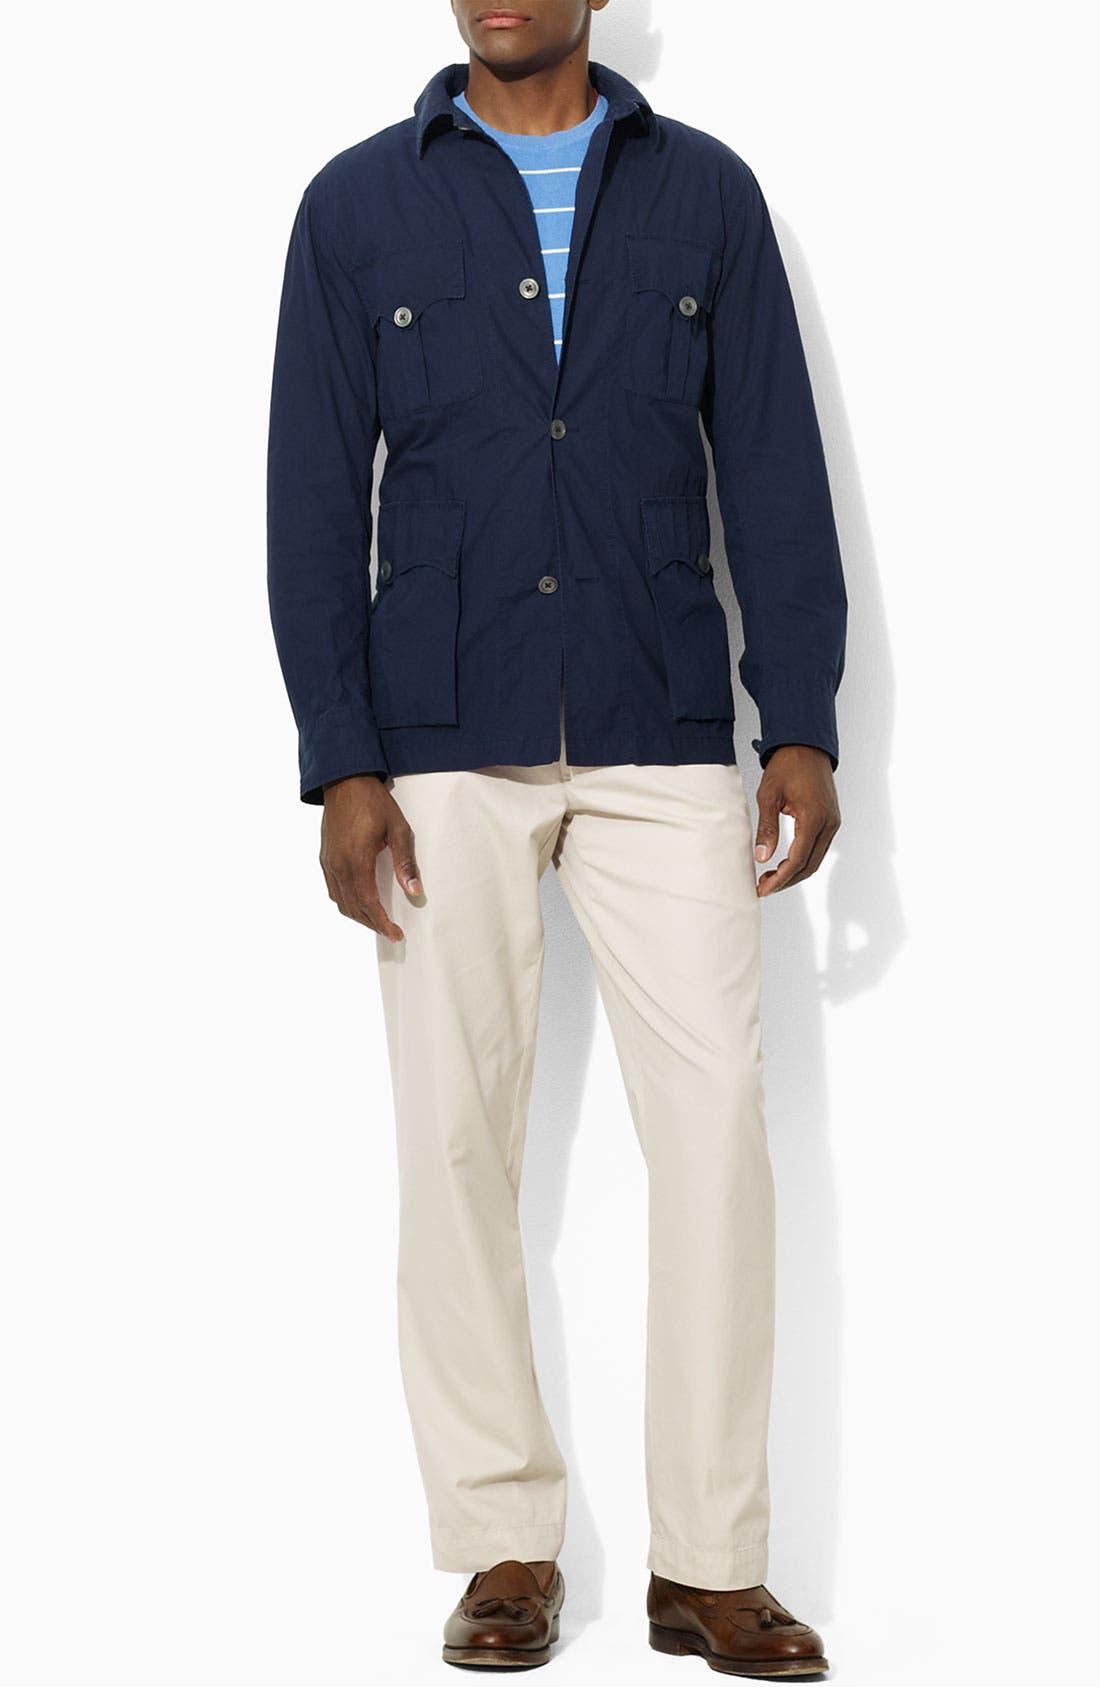 Alternate Image 1 Selected - Polo Ralph Lauren Cotton Poplin Safari Jacket